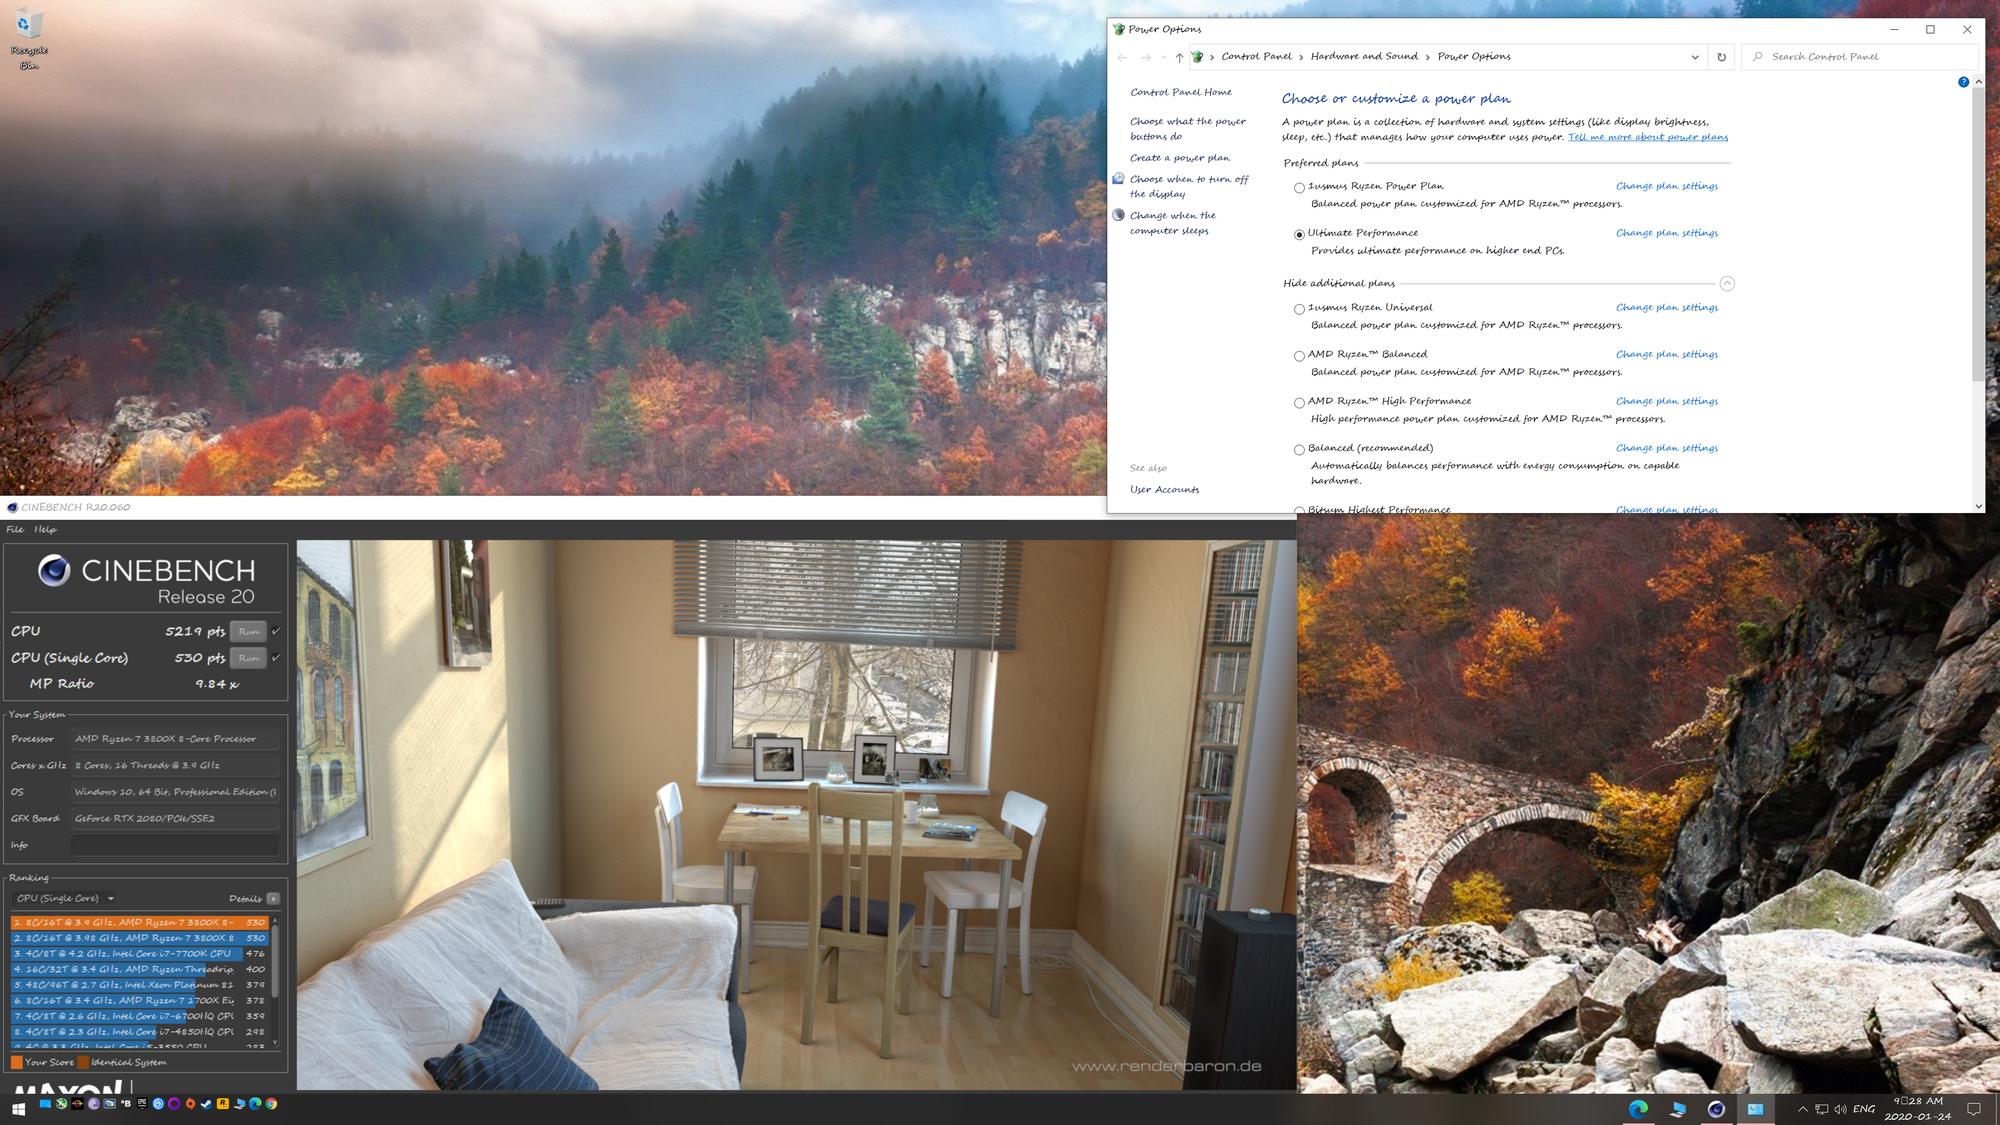 Desktop-Screenshot-2020-01-24-09-27-58-82.png